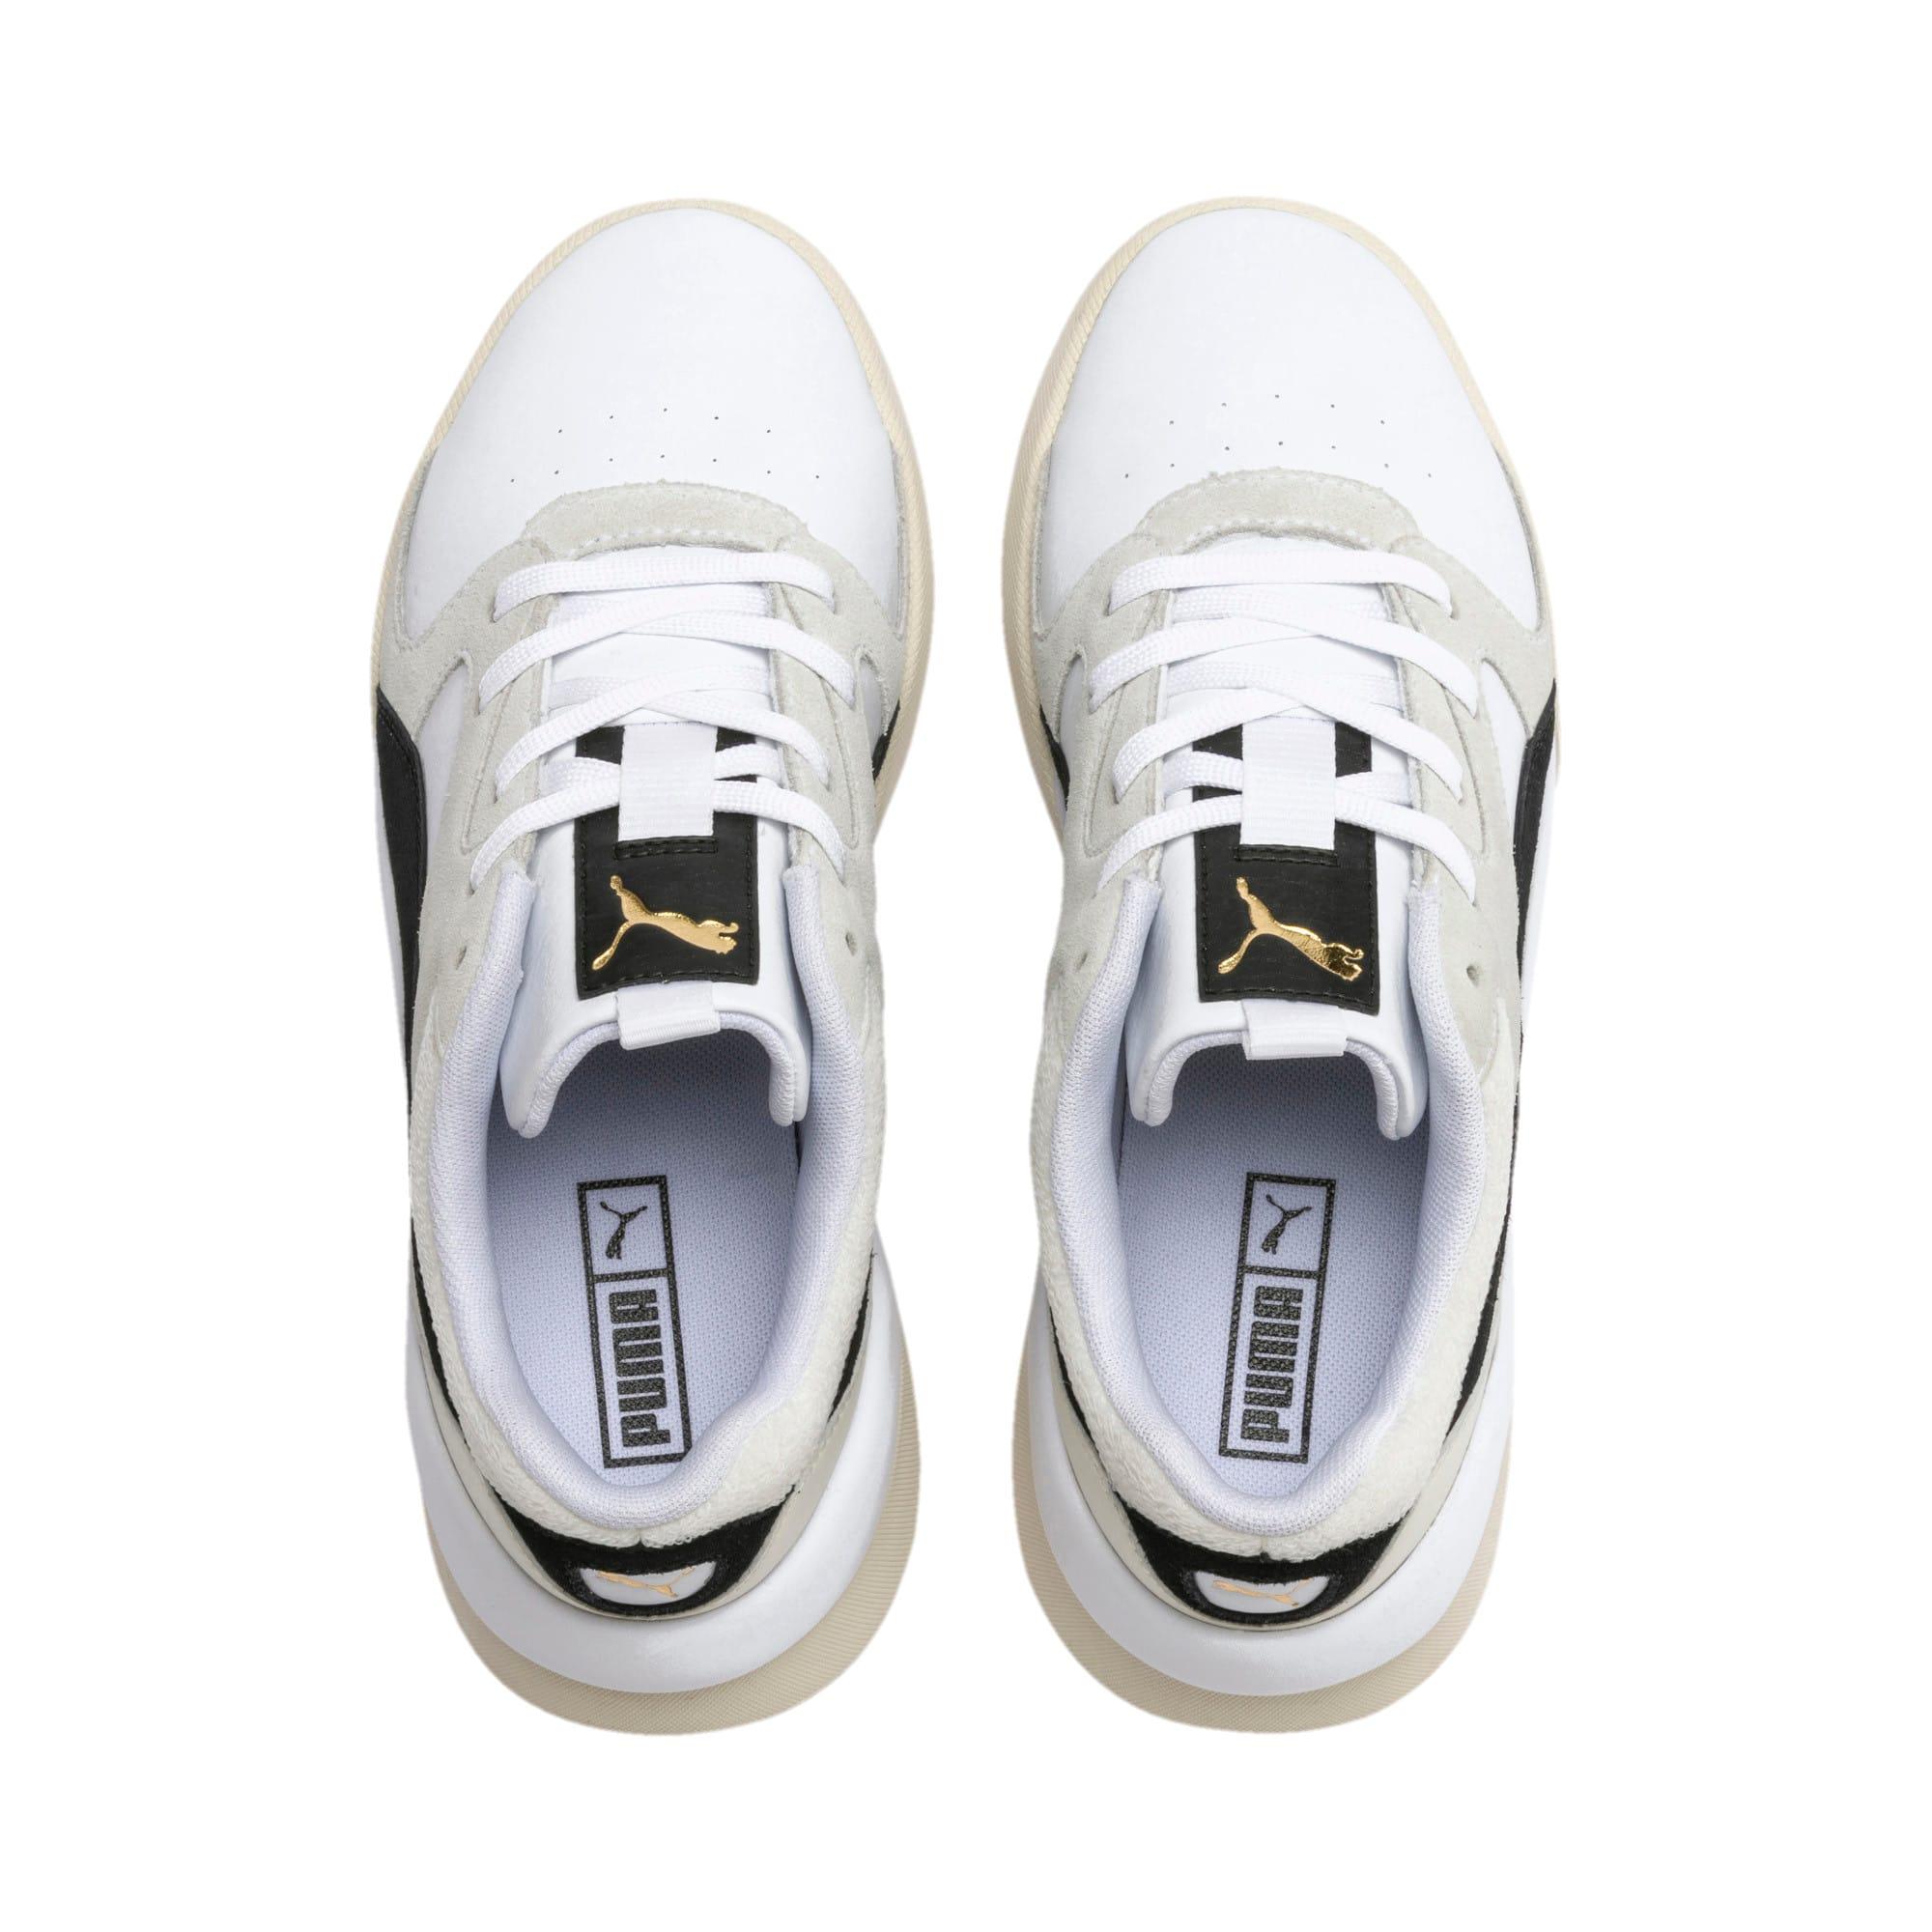 Thumbnail 7 of Aeon Heritage Women's Sneakers, Puma White-Puma Black, medium